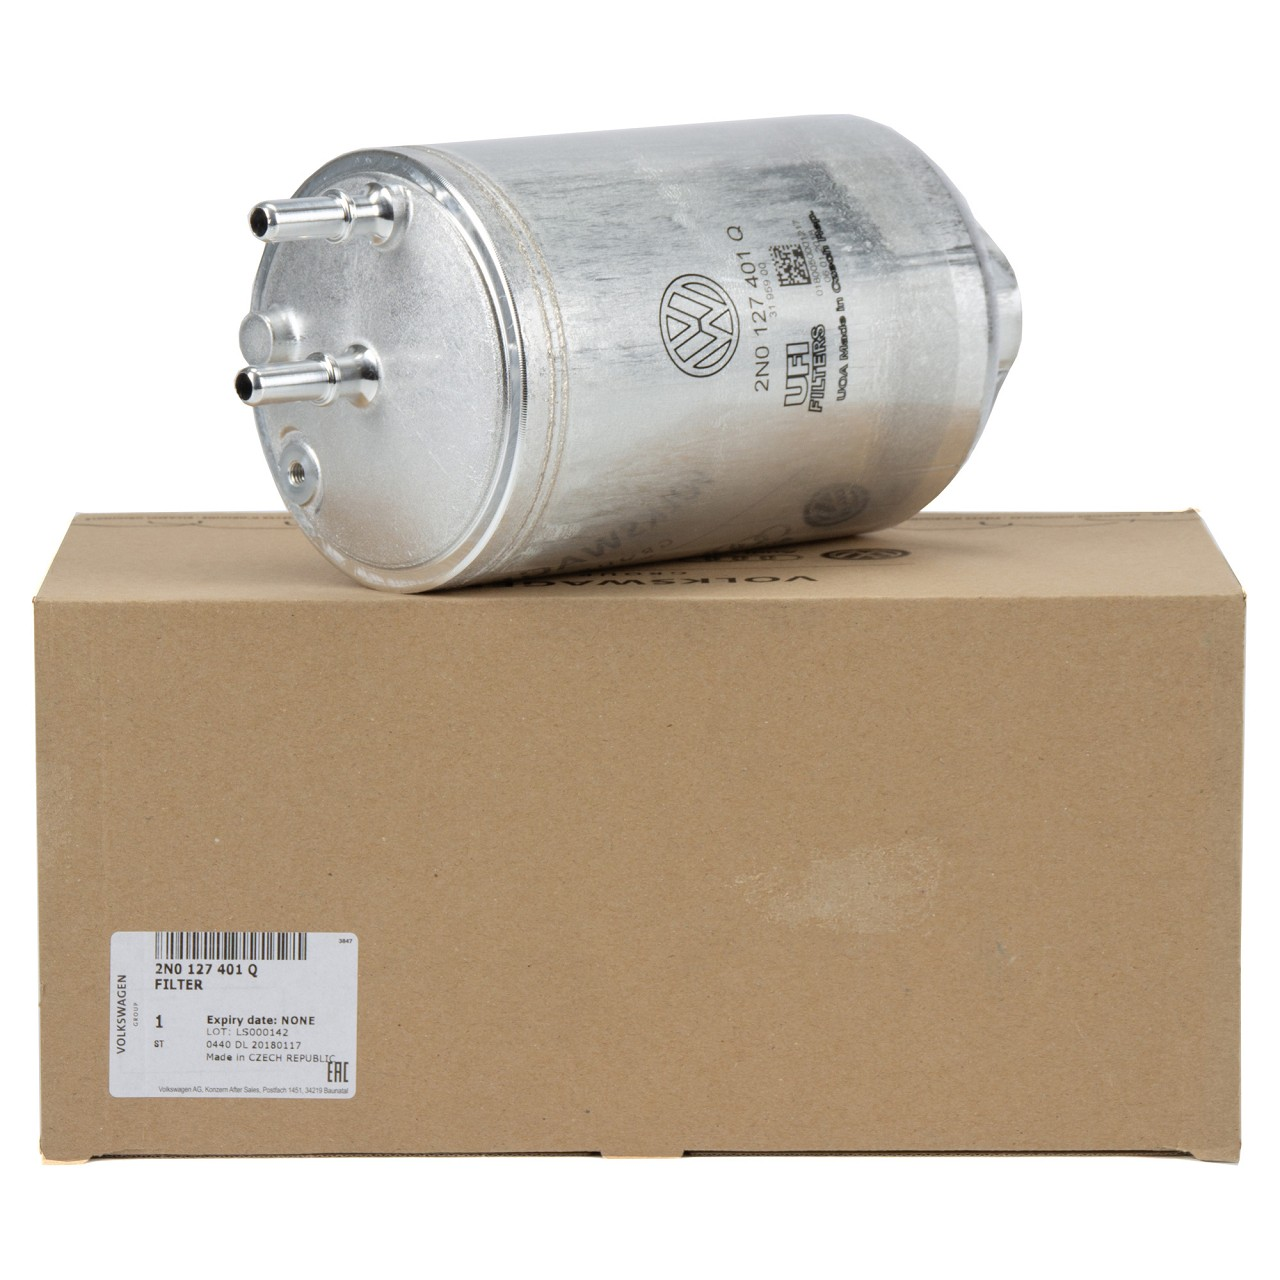 ORIGINAL VW Kraftstofffilter Dieselfilter CRAFTER (SY SX SZ) 2.0 TDI 2N0127401Q